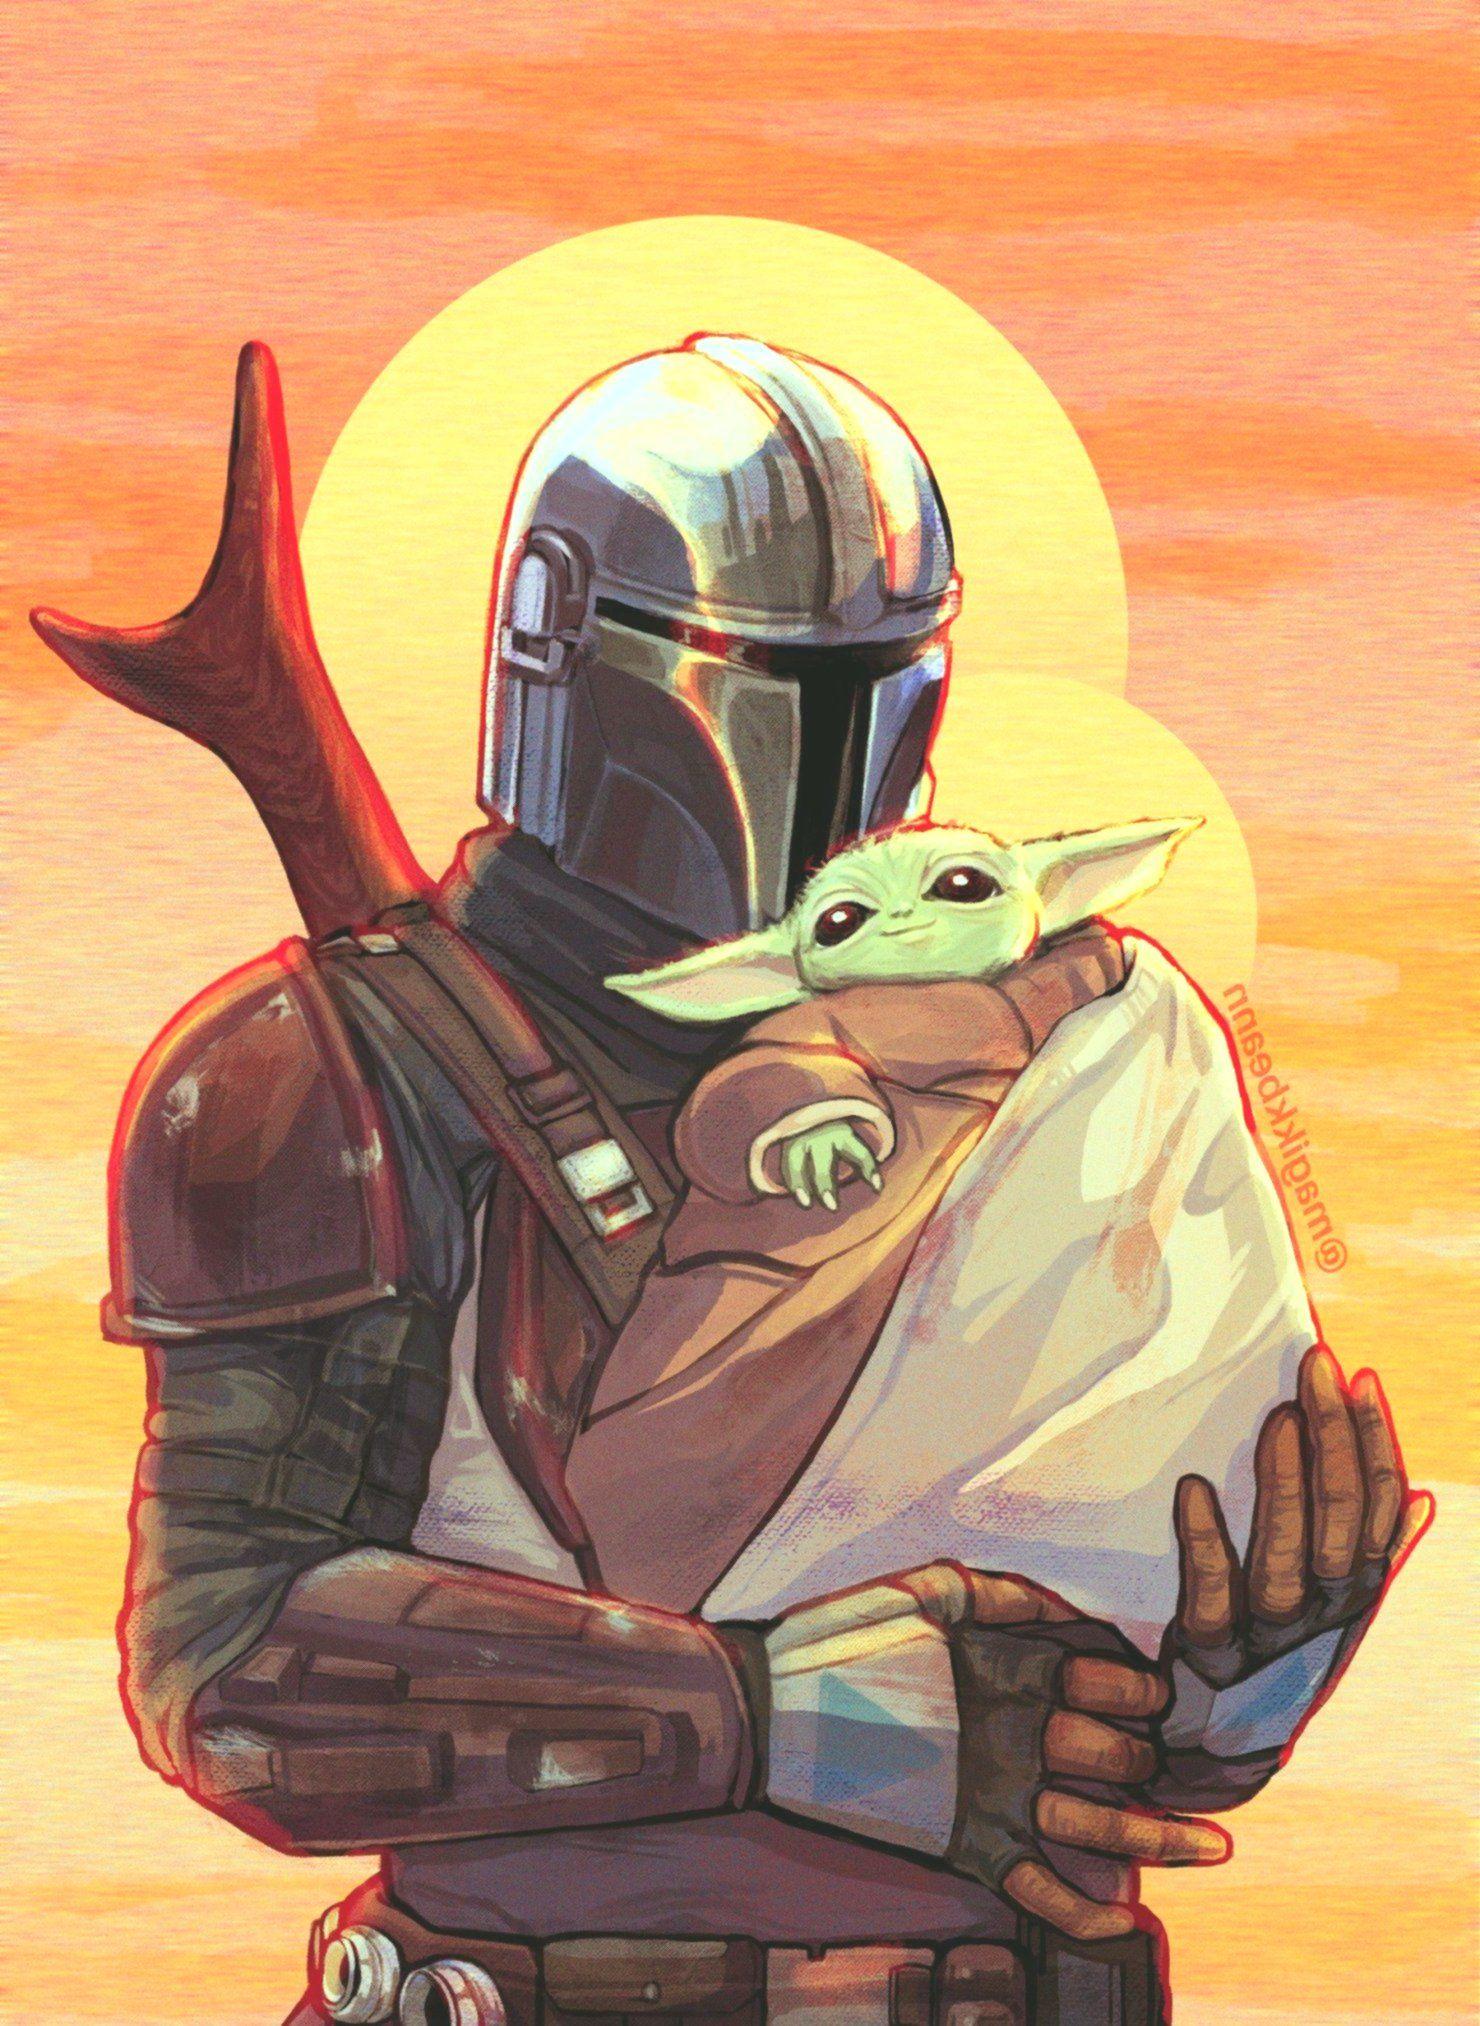 17 Beautiful Baby Yoda Wallpapers Yoda Wallpaper Star Wars Wallpaper Yoda Pictures